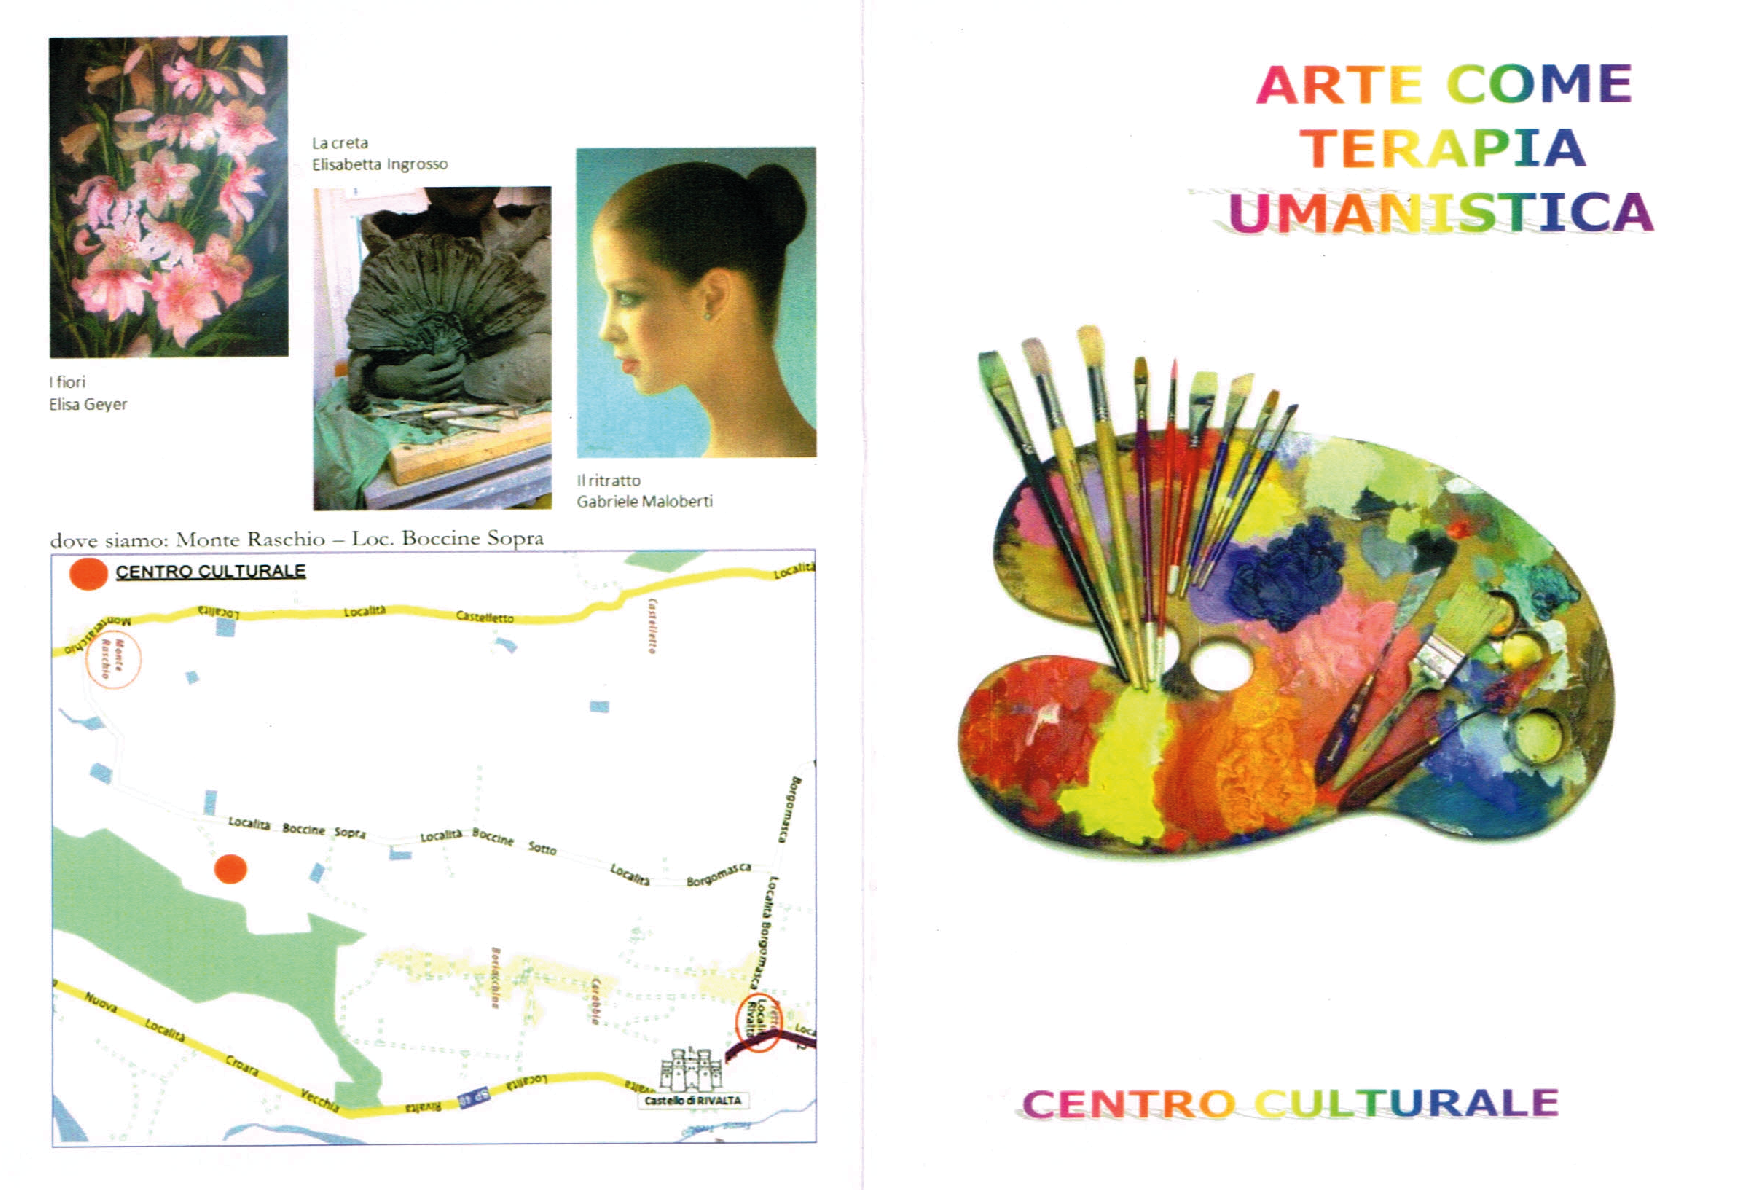 arte come terapia umanistica